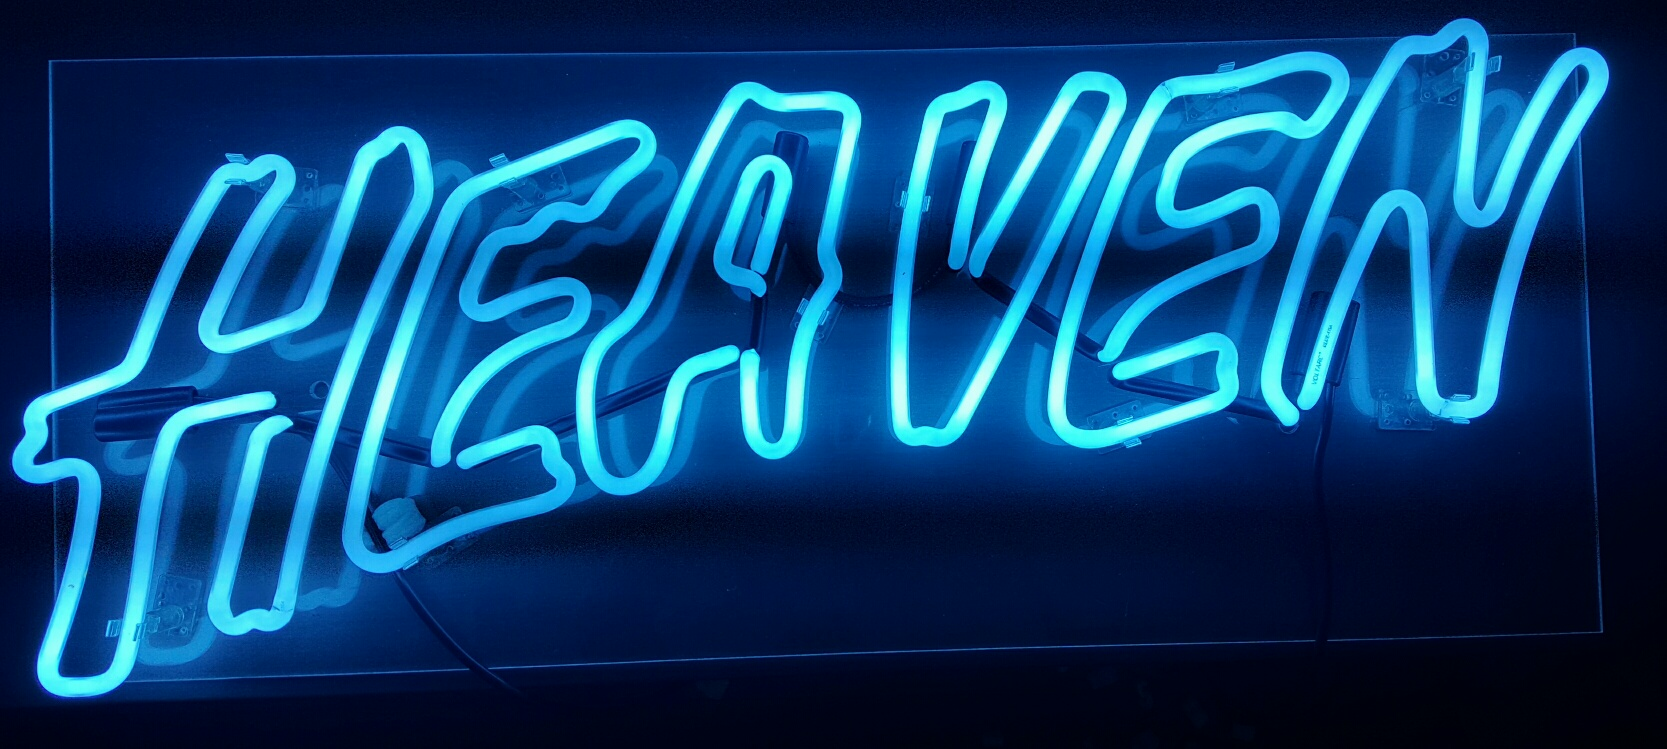 Neonblueblueglass.jpg